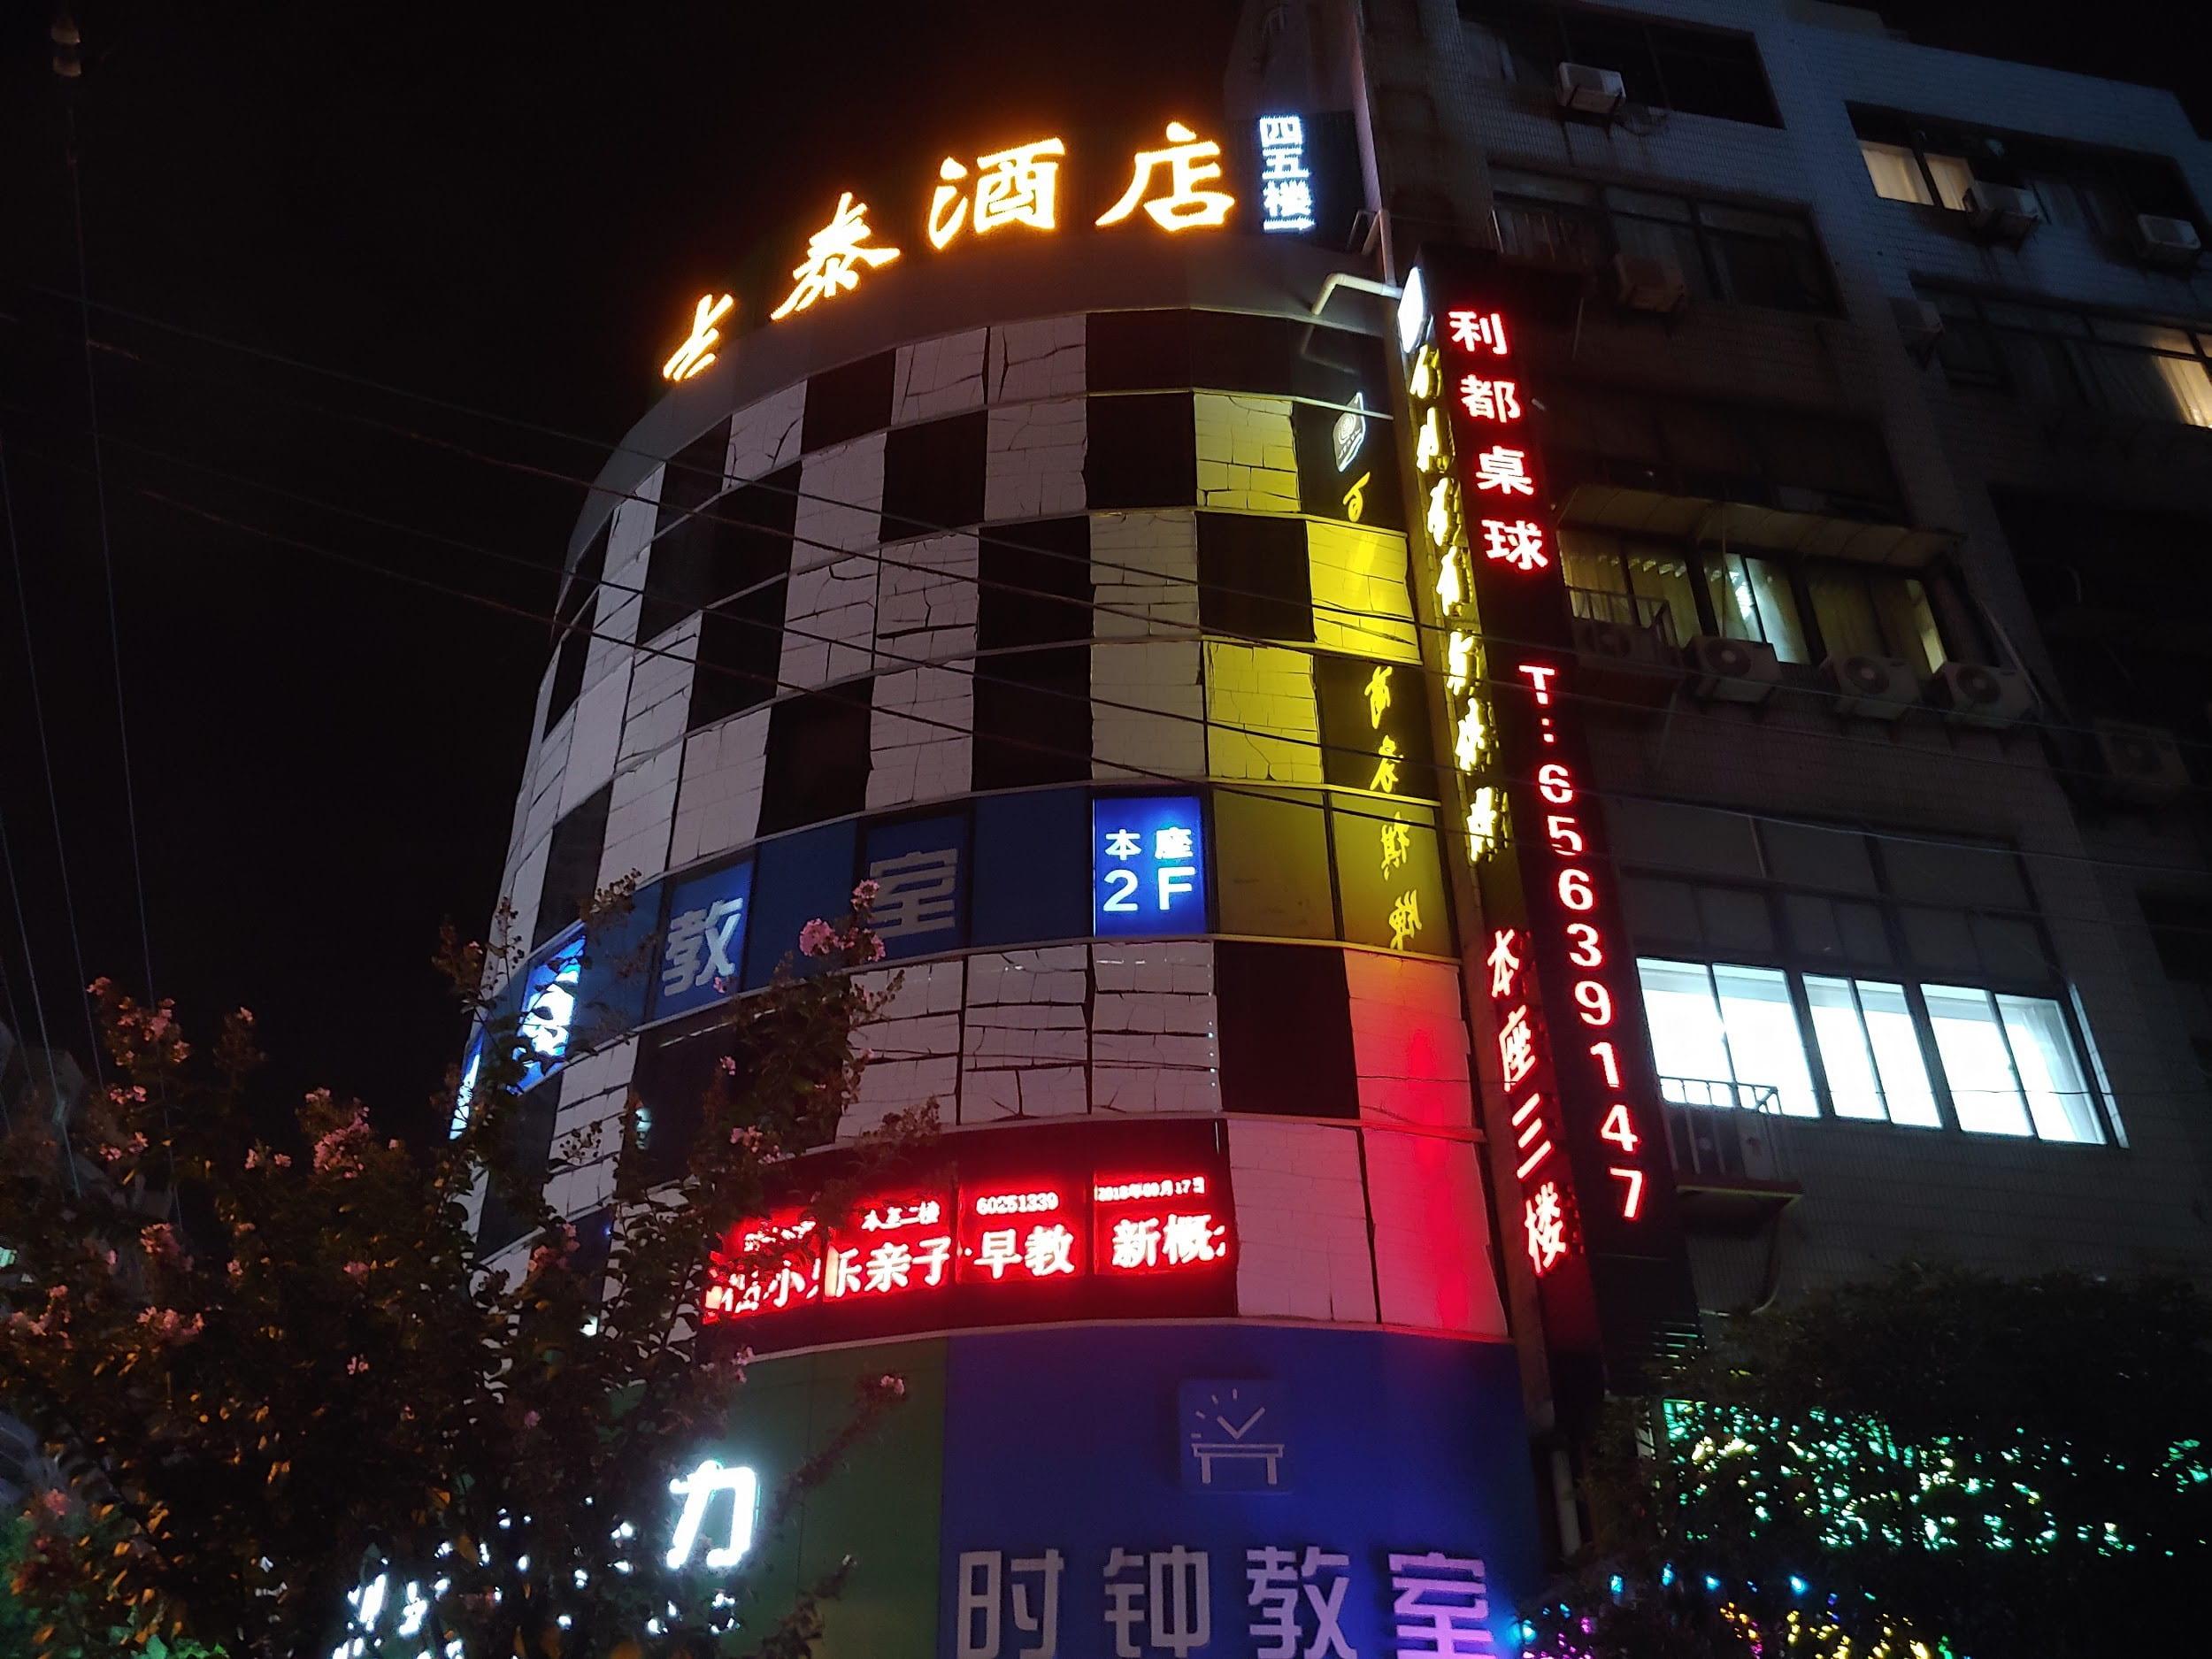 Neon building in Shanghai